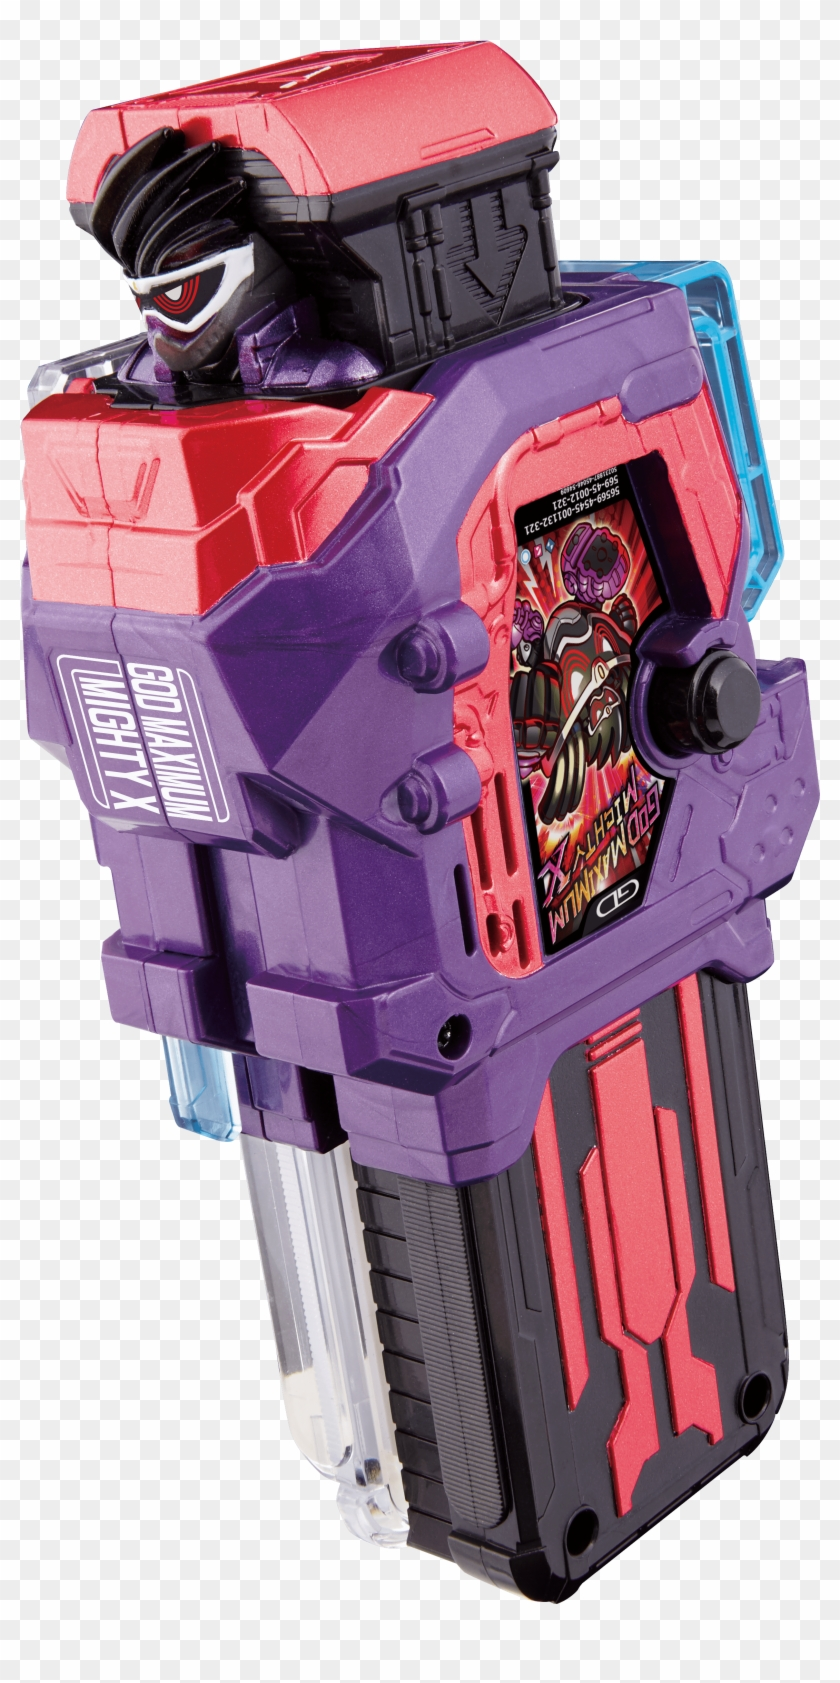 Kamen Rider Ex Aid Trilogy God Maximum Mighty X Gashat Hd Png Download 2883x4951 4373549 Pngfind